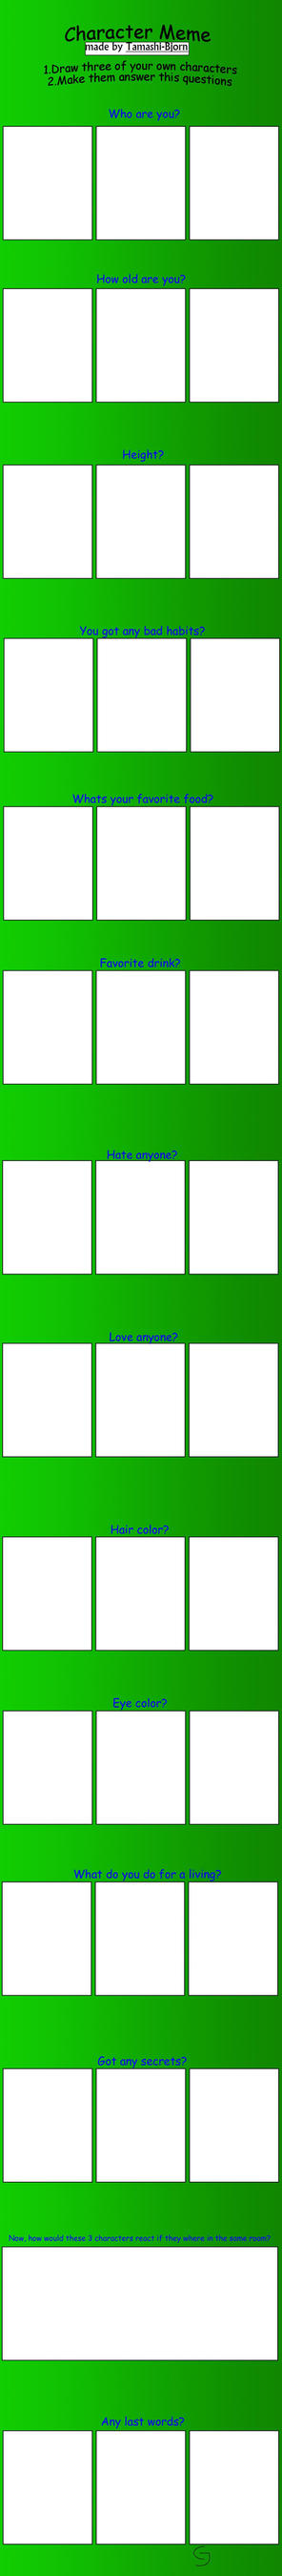 Oc character meme blank by Tamashi-Bjorn